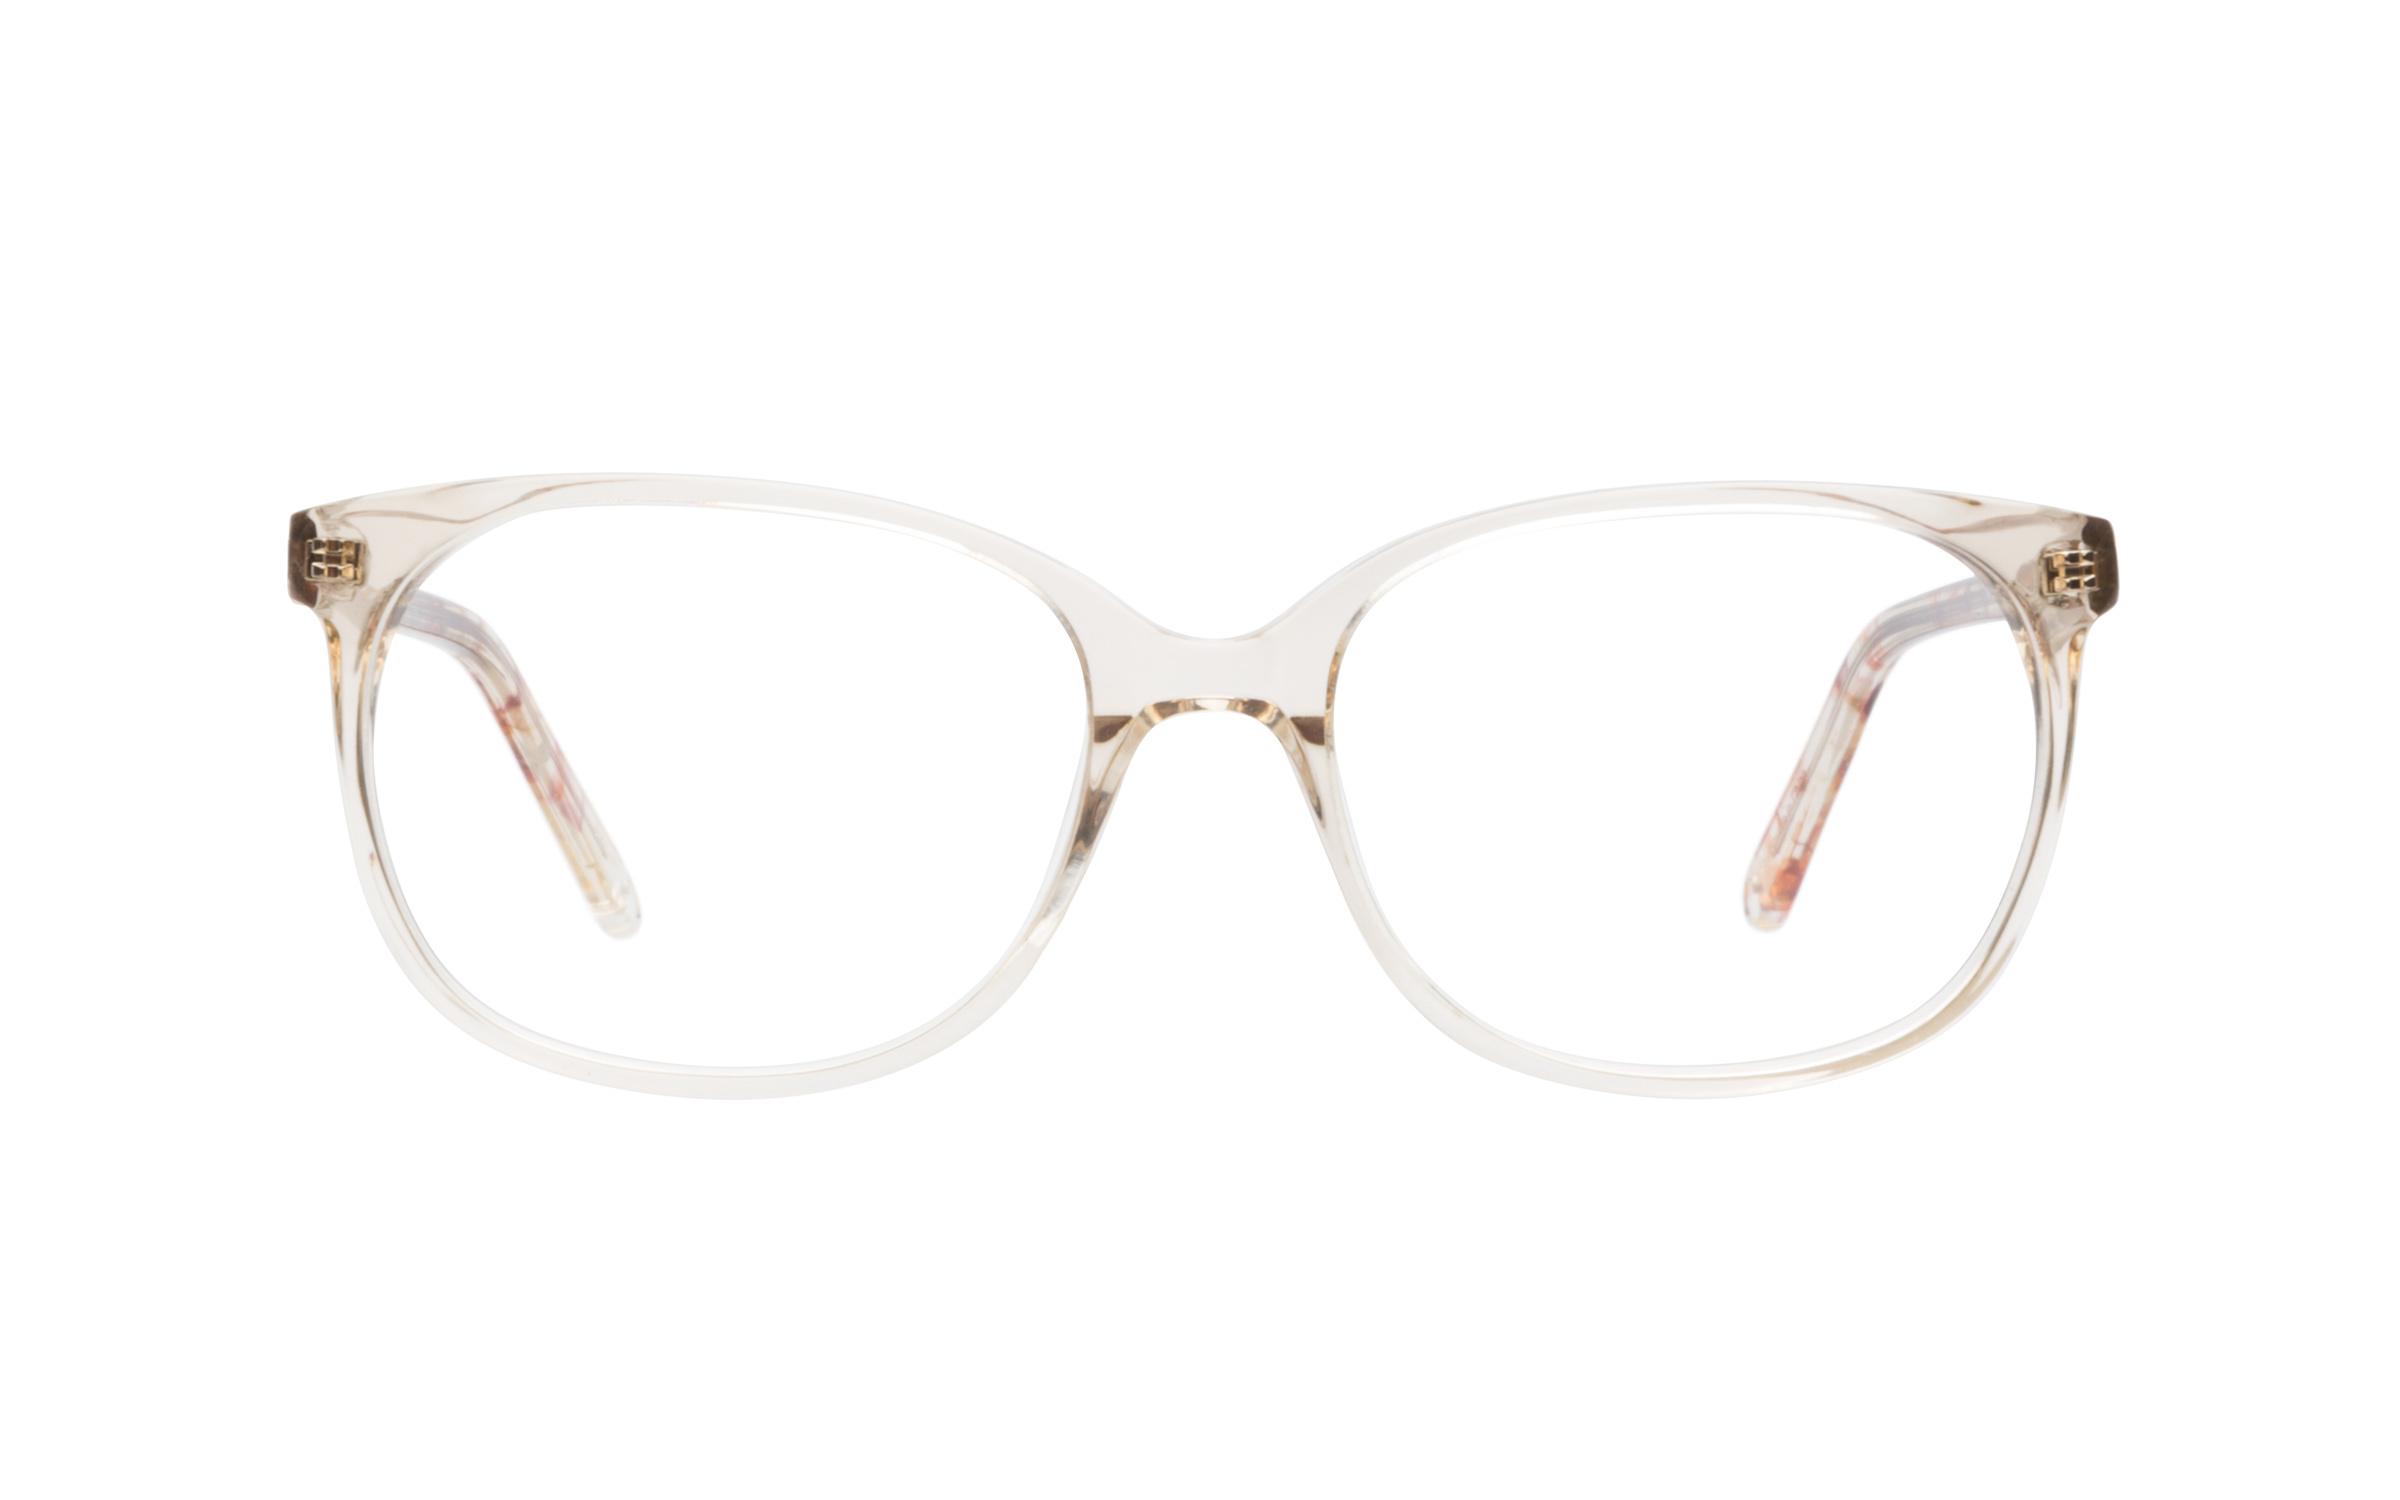 Womens_Glasses_BrownClearPink_Love_Online_Coastal